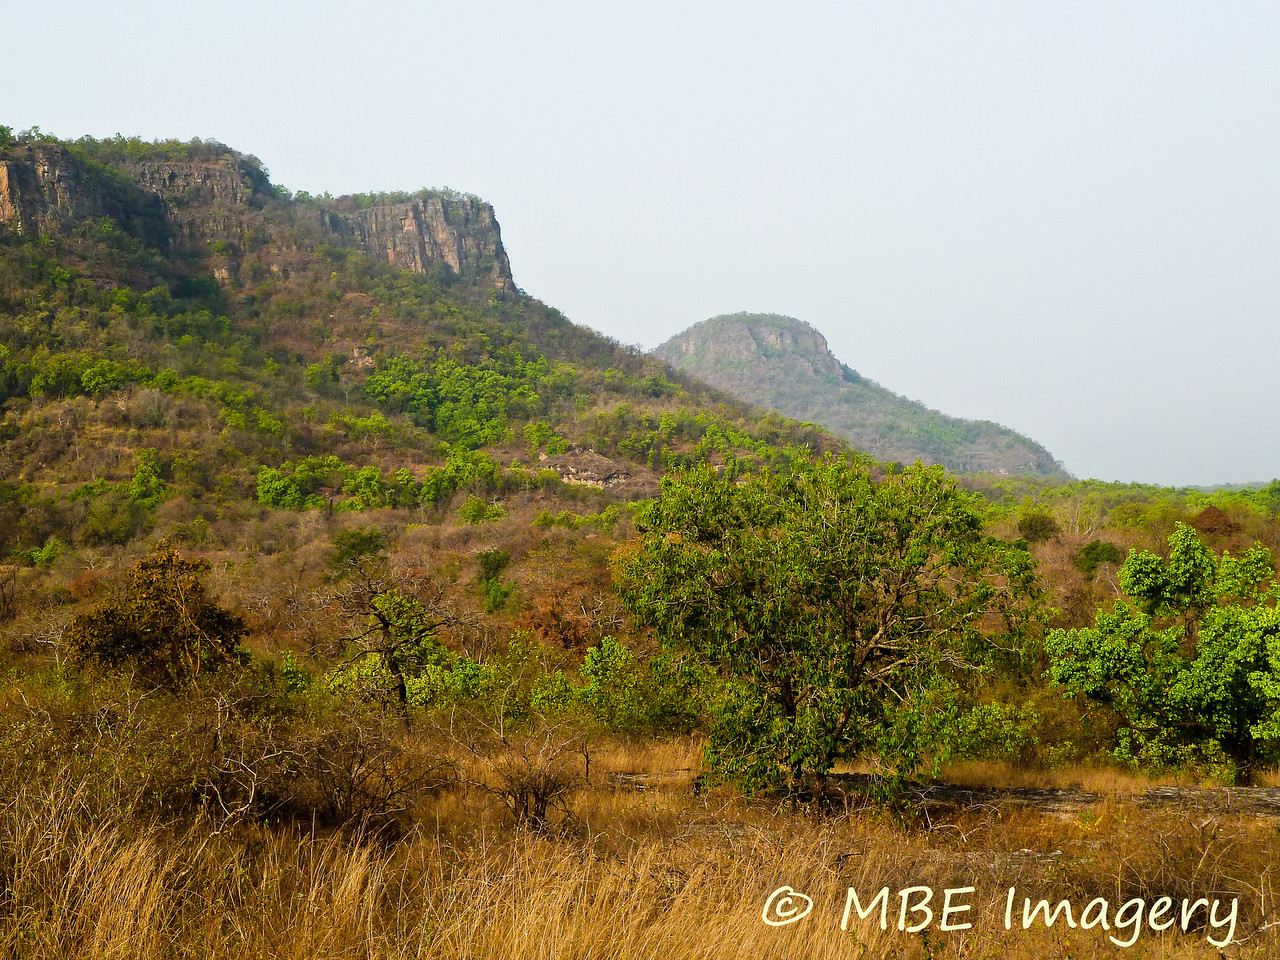 Rugges scenery at Bandhavgarh National Park